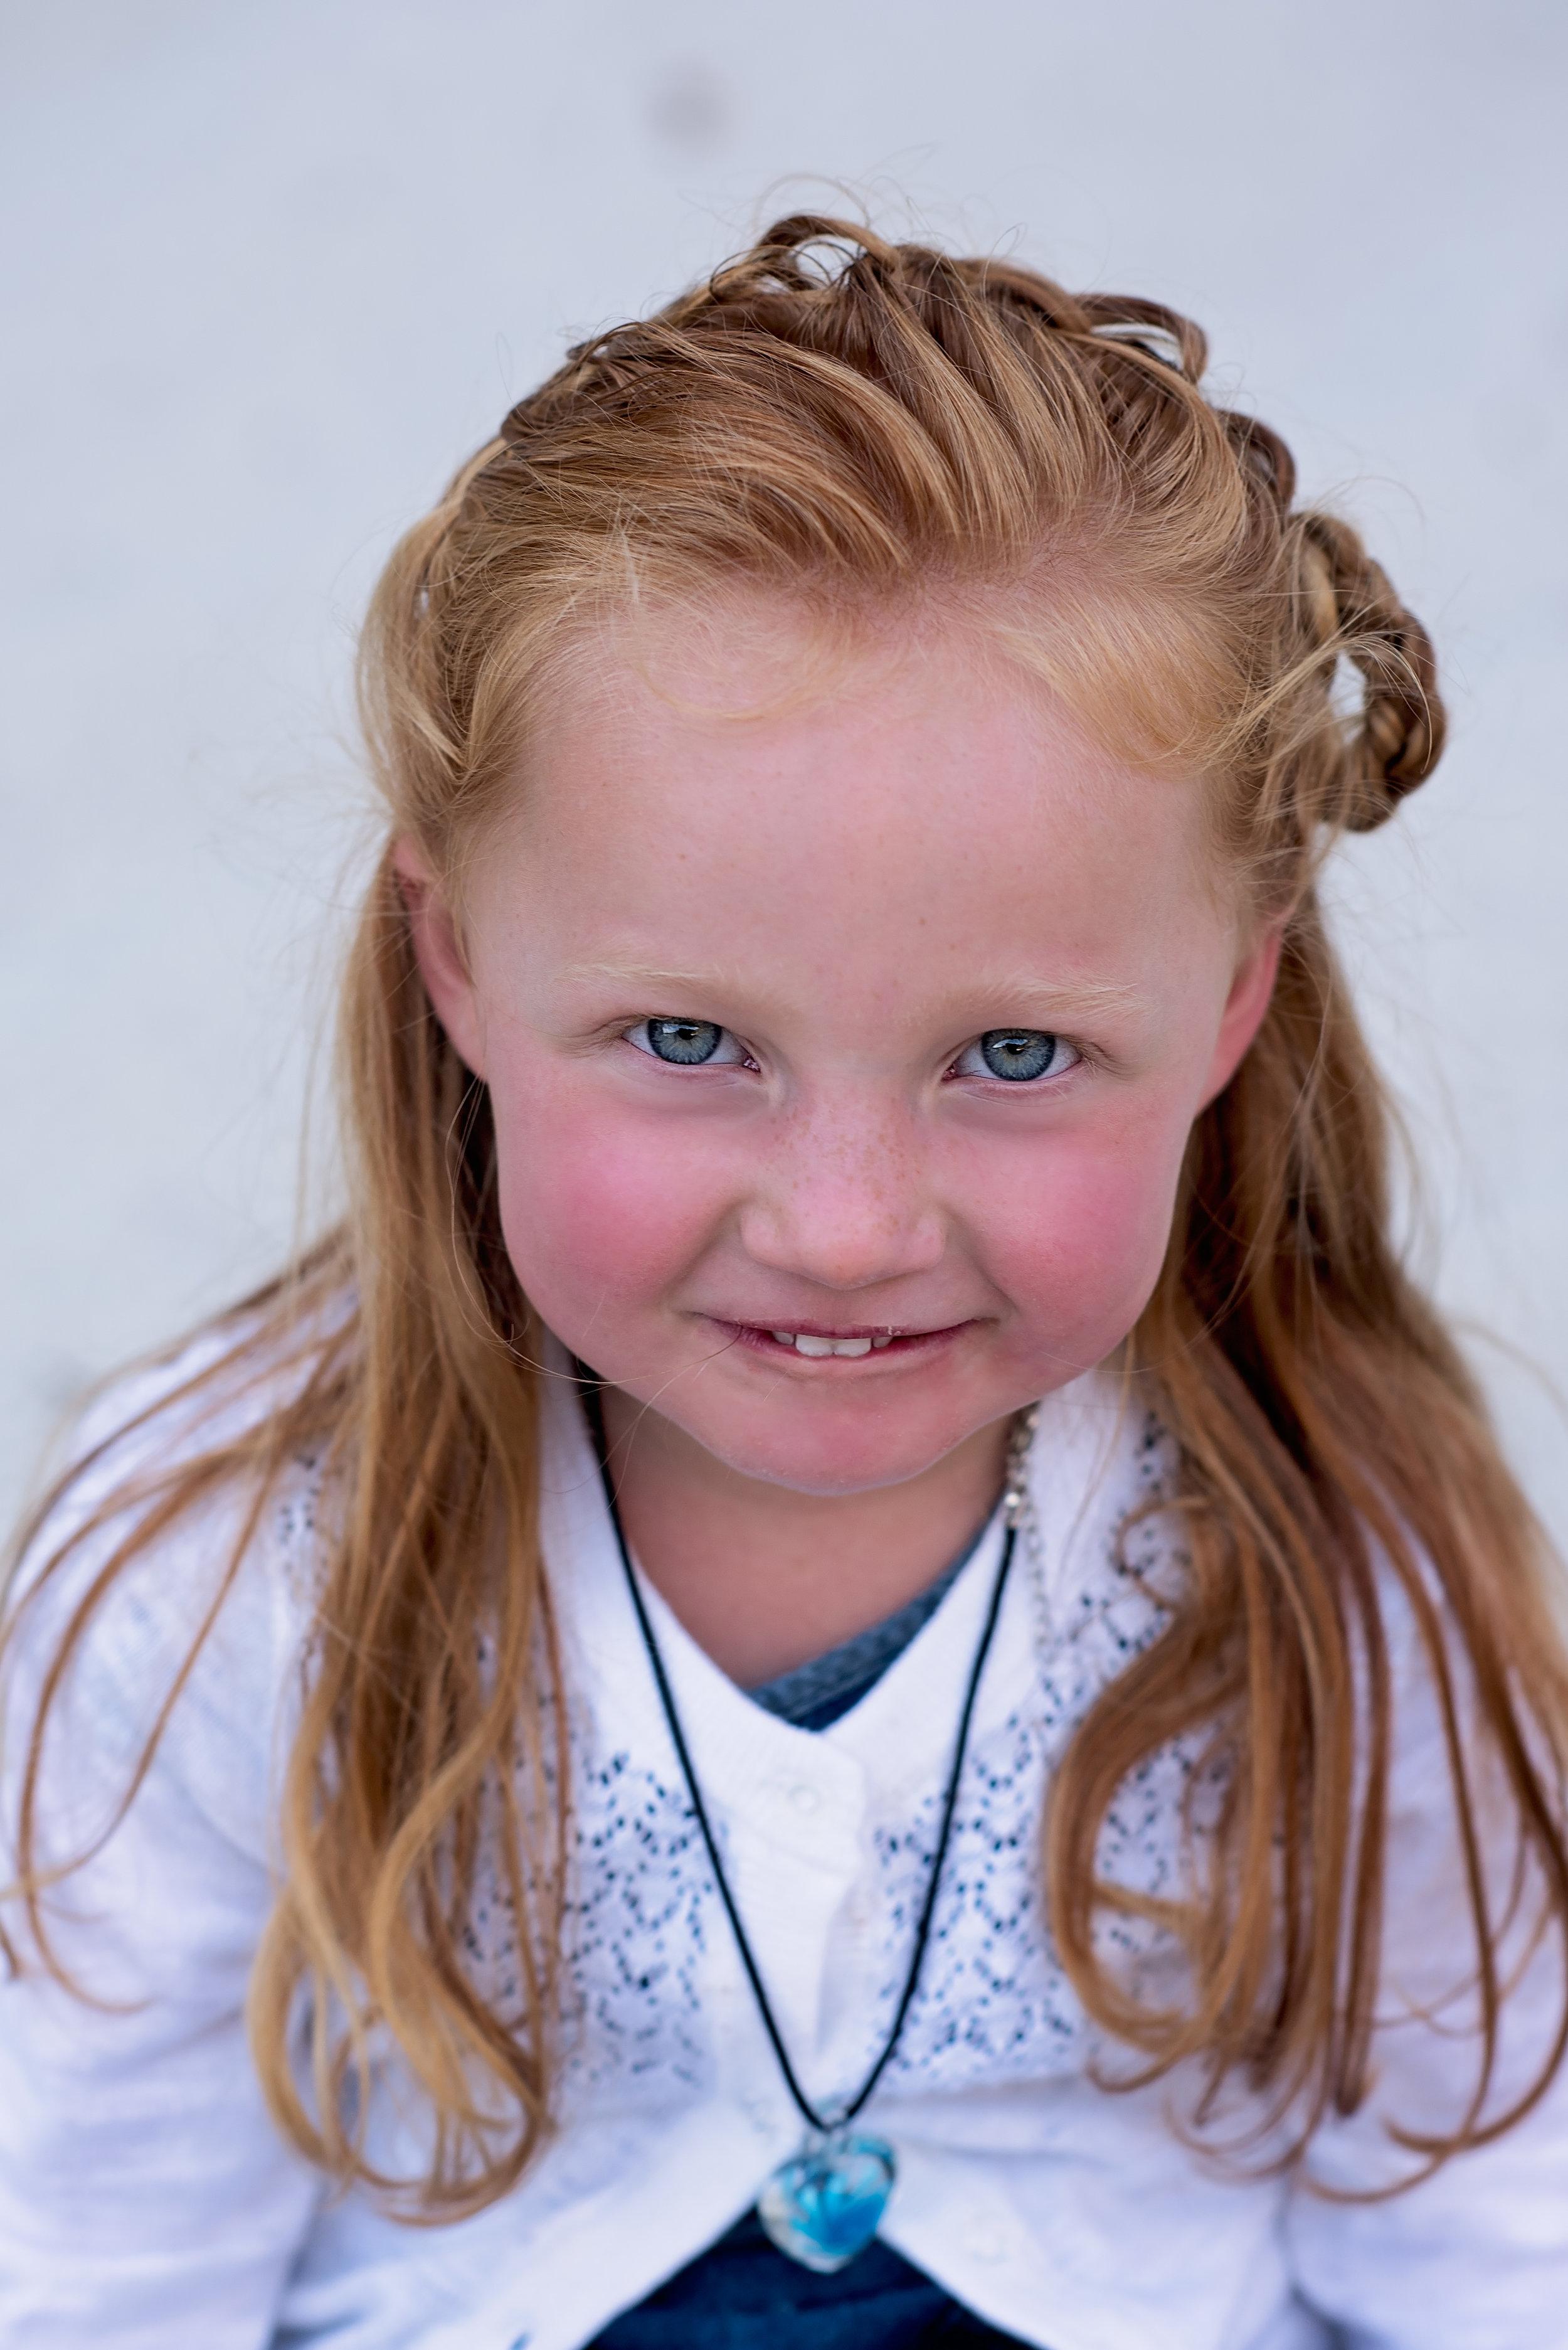 Kids Portraits, Carmel, Ca